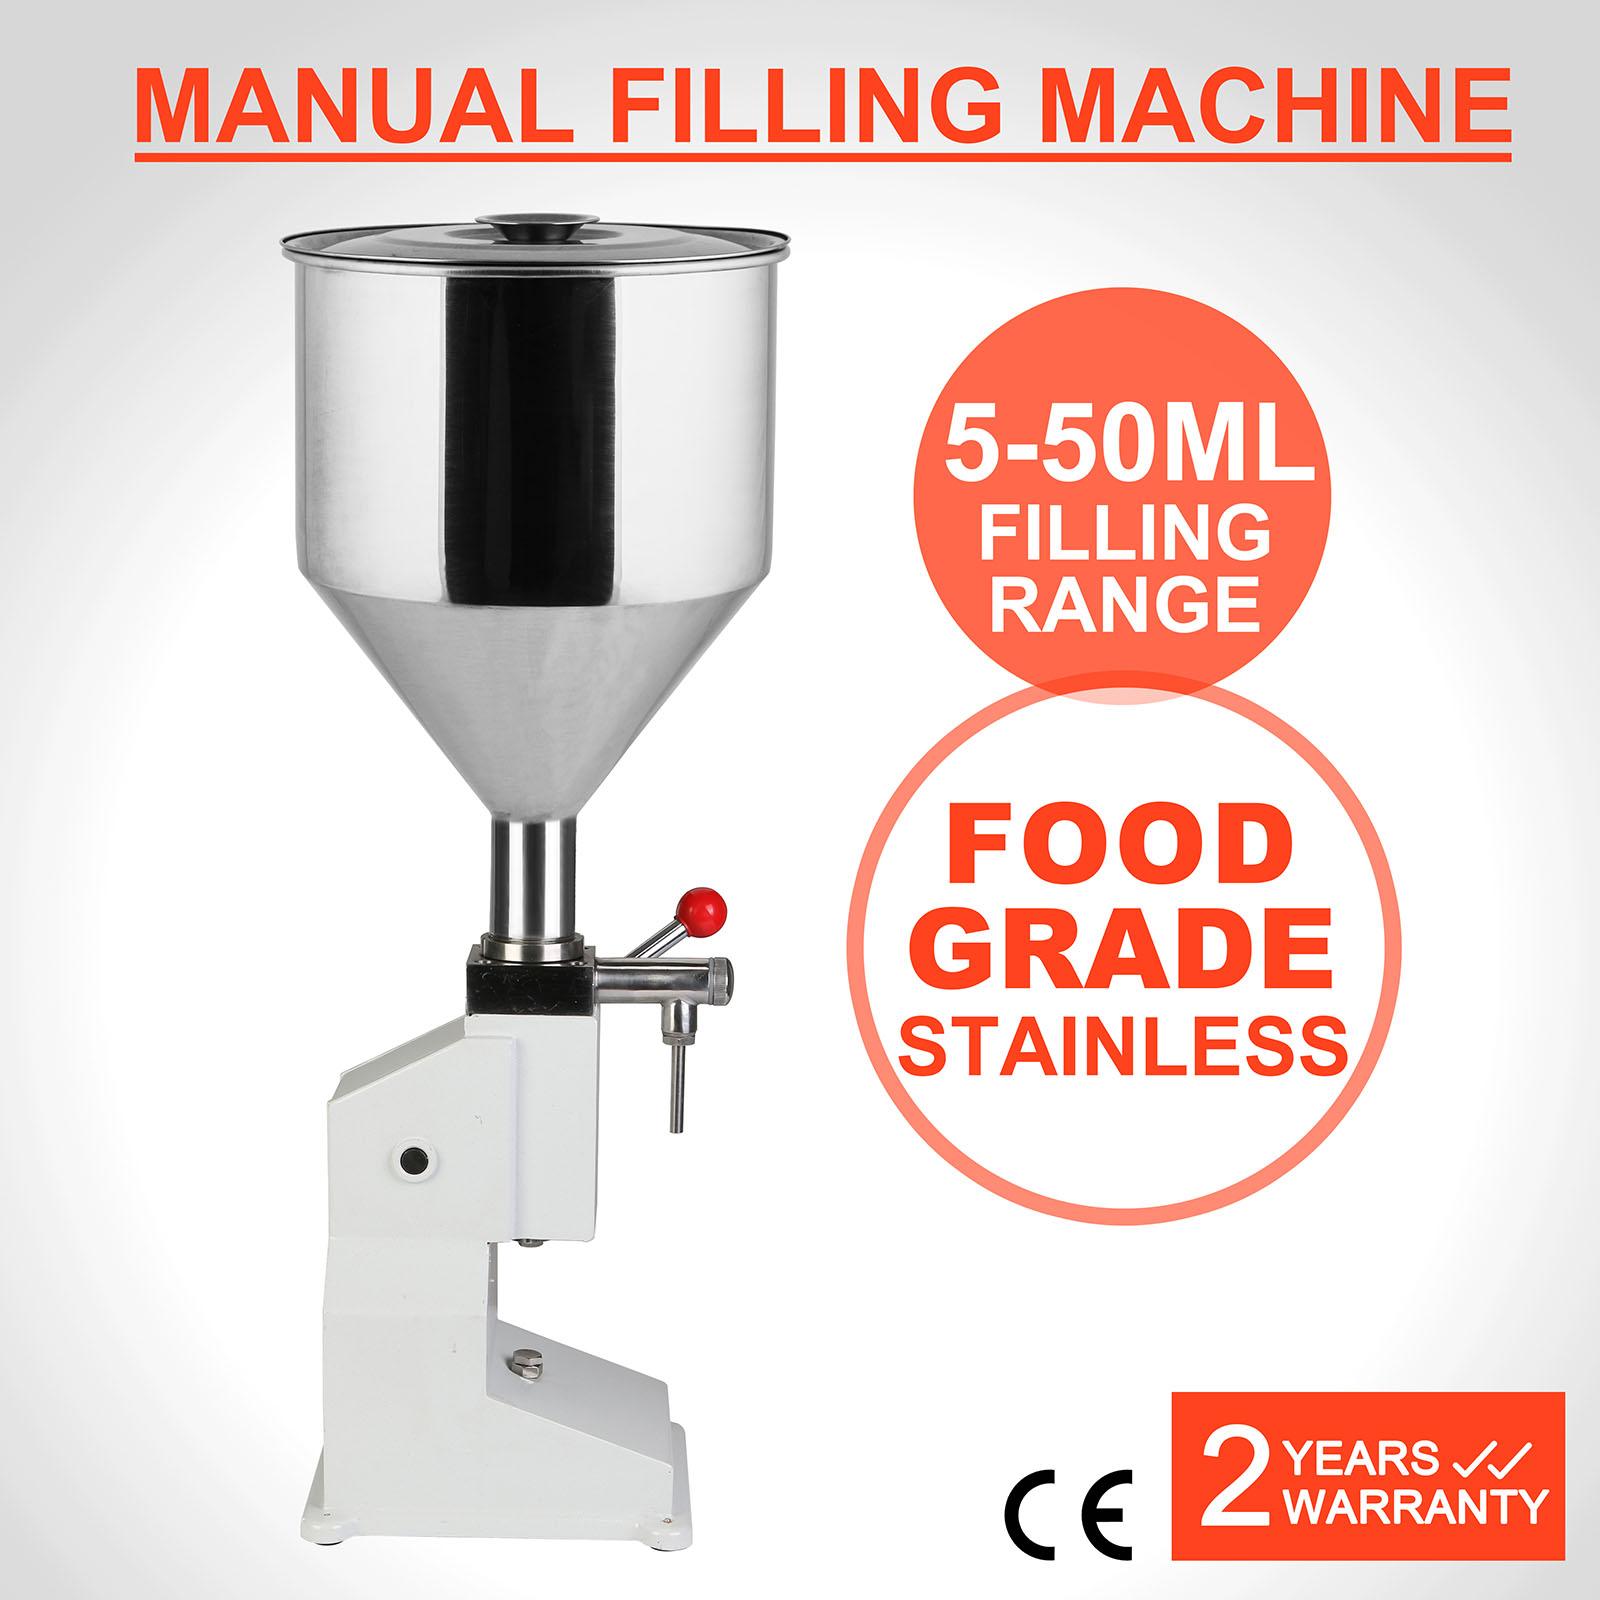 Liquid-Filling-Machine-Filler-Remplissage-2-3500ML-50-500ML-INDUSTRY-SUPPLY miniature 13